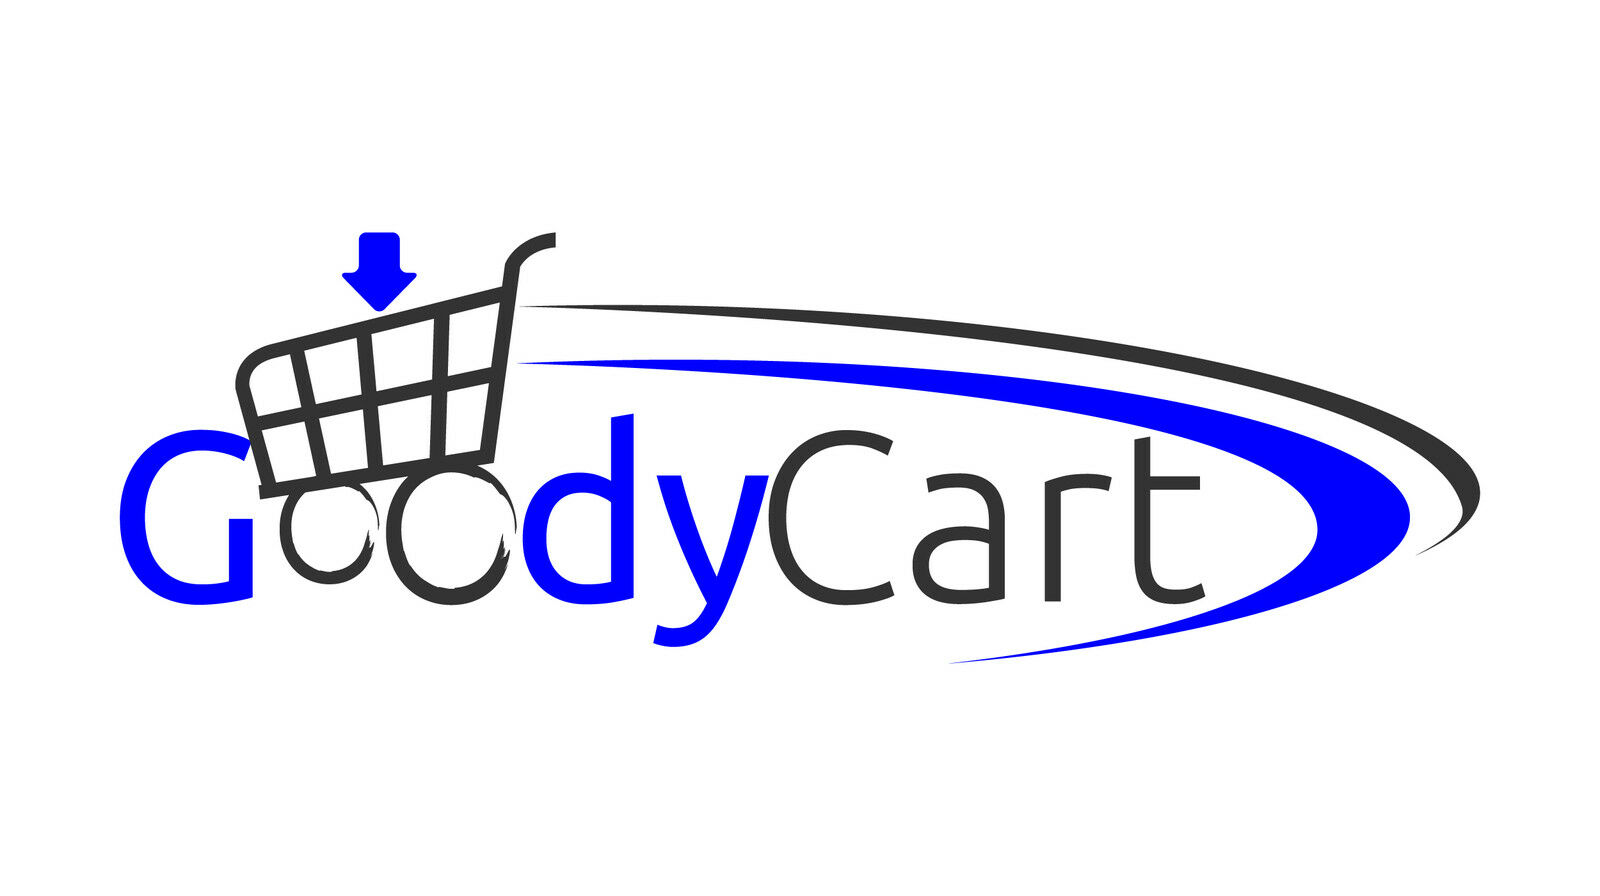 Goodycart